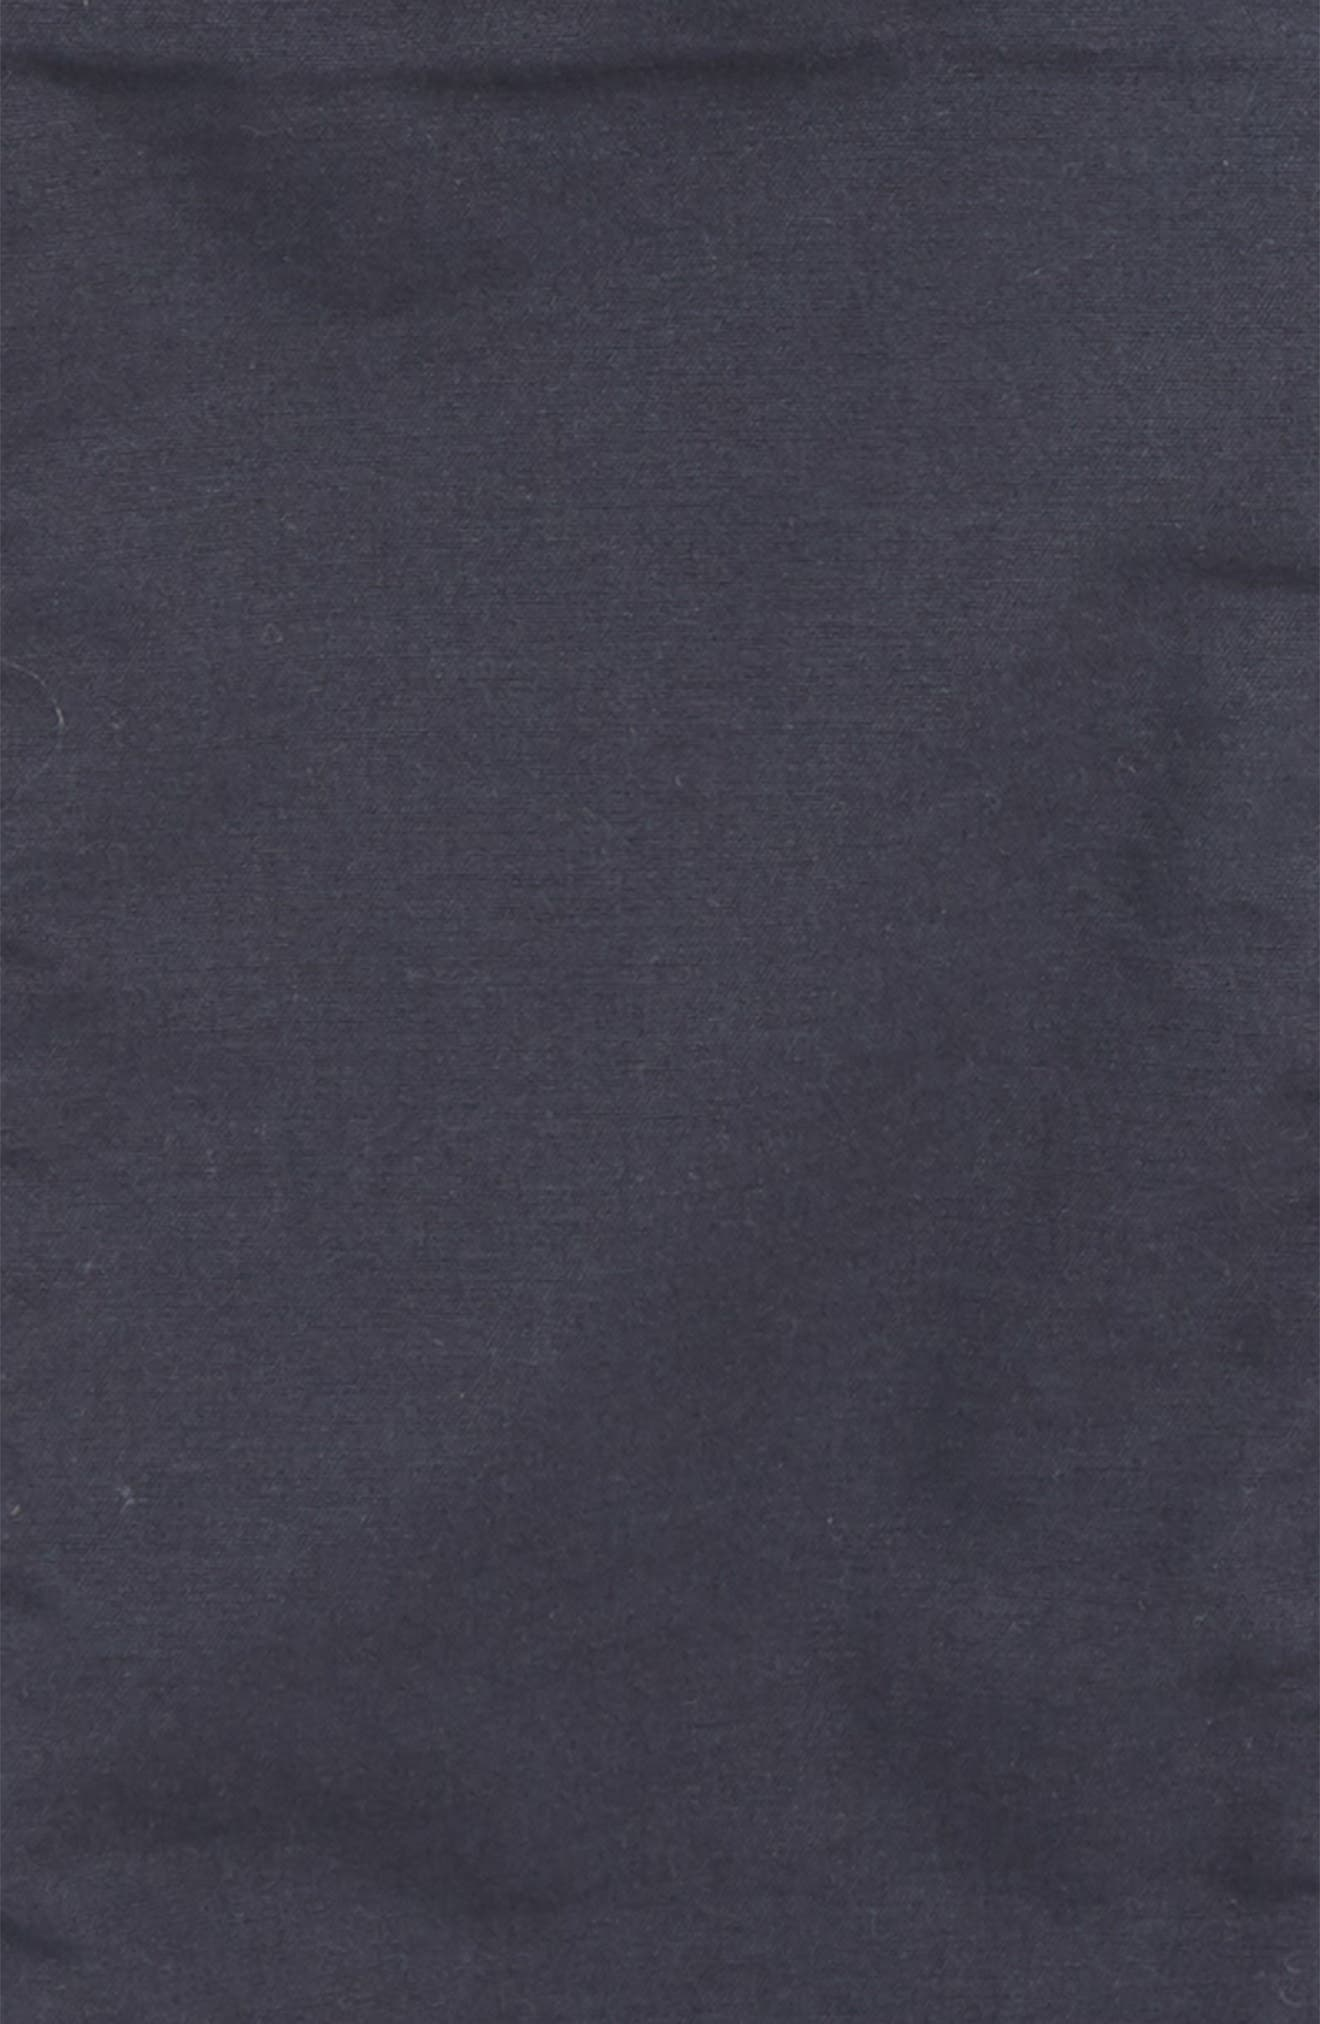 Lined Jogger Pants,                             Alternate thumbnail 2, color,                             411